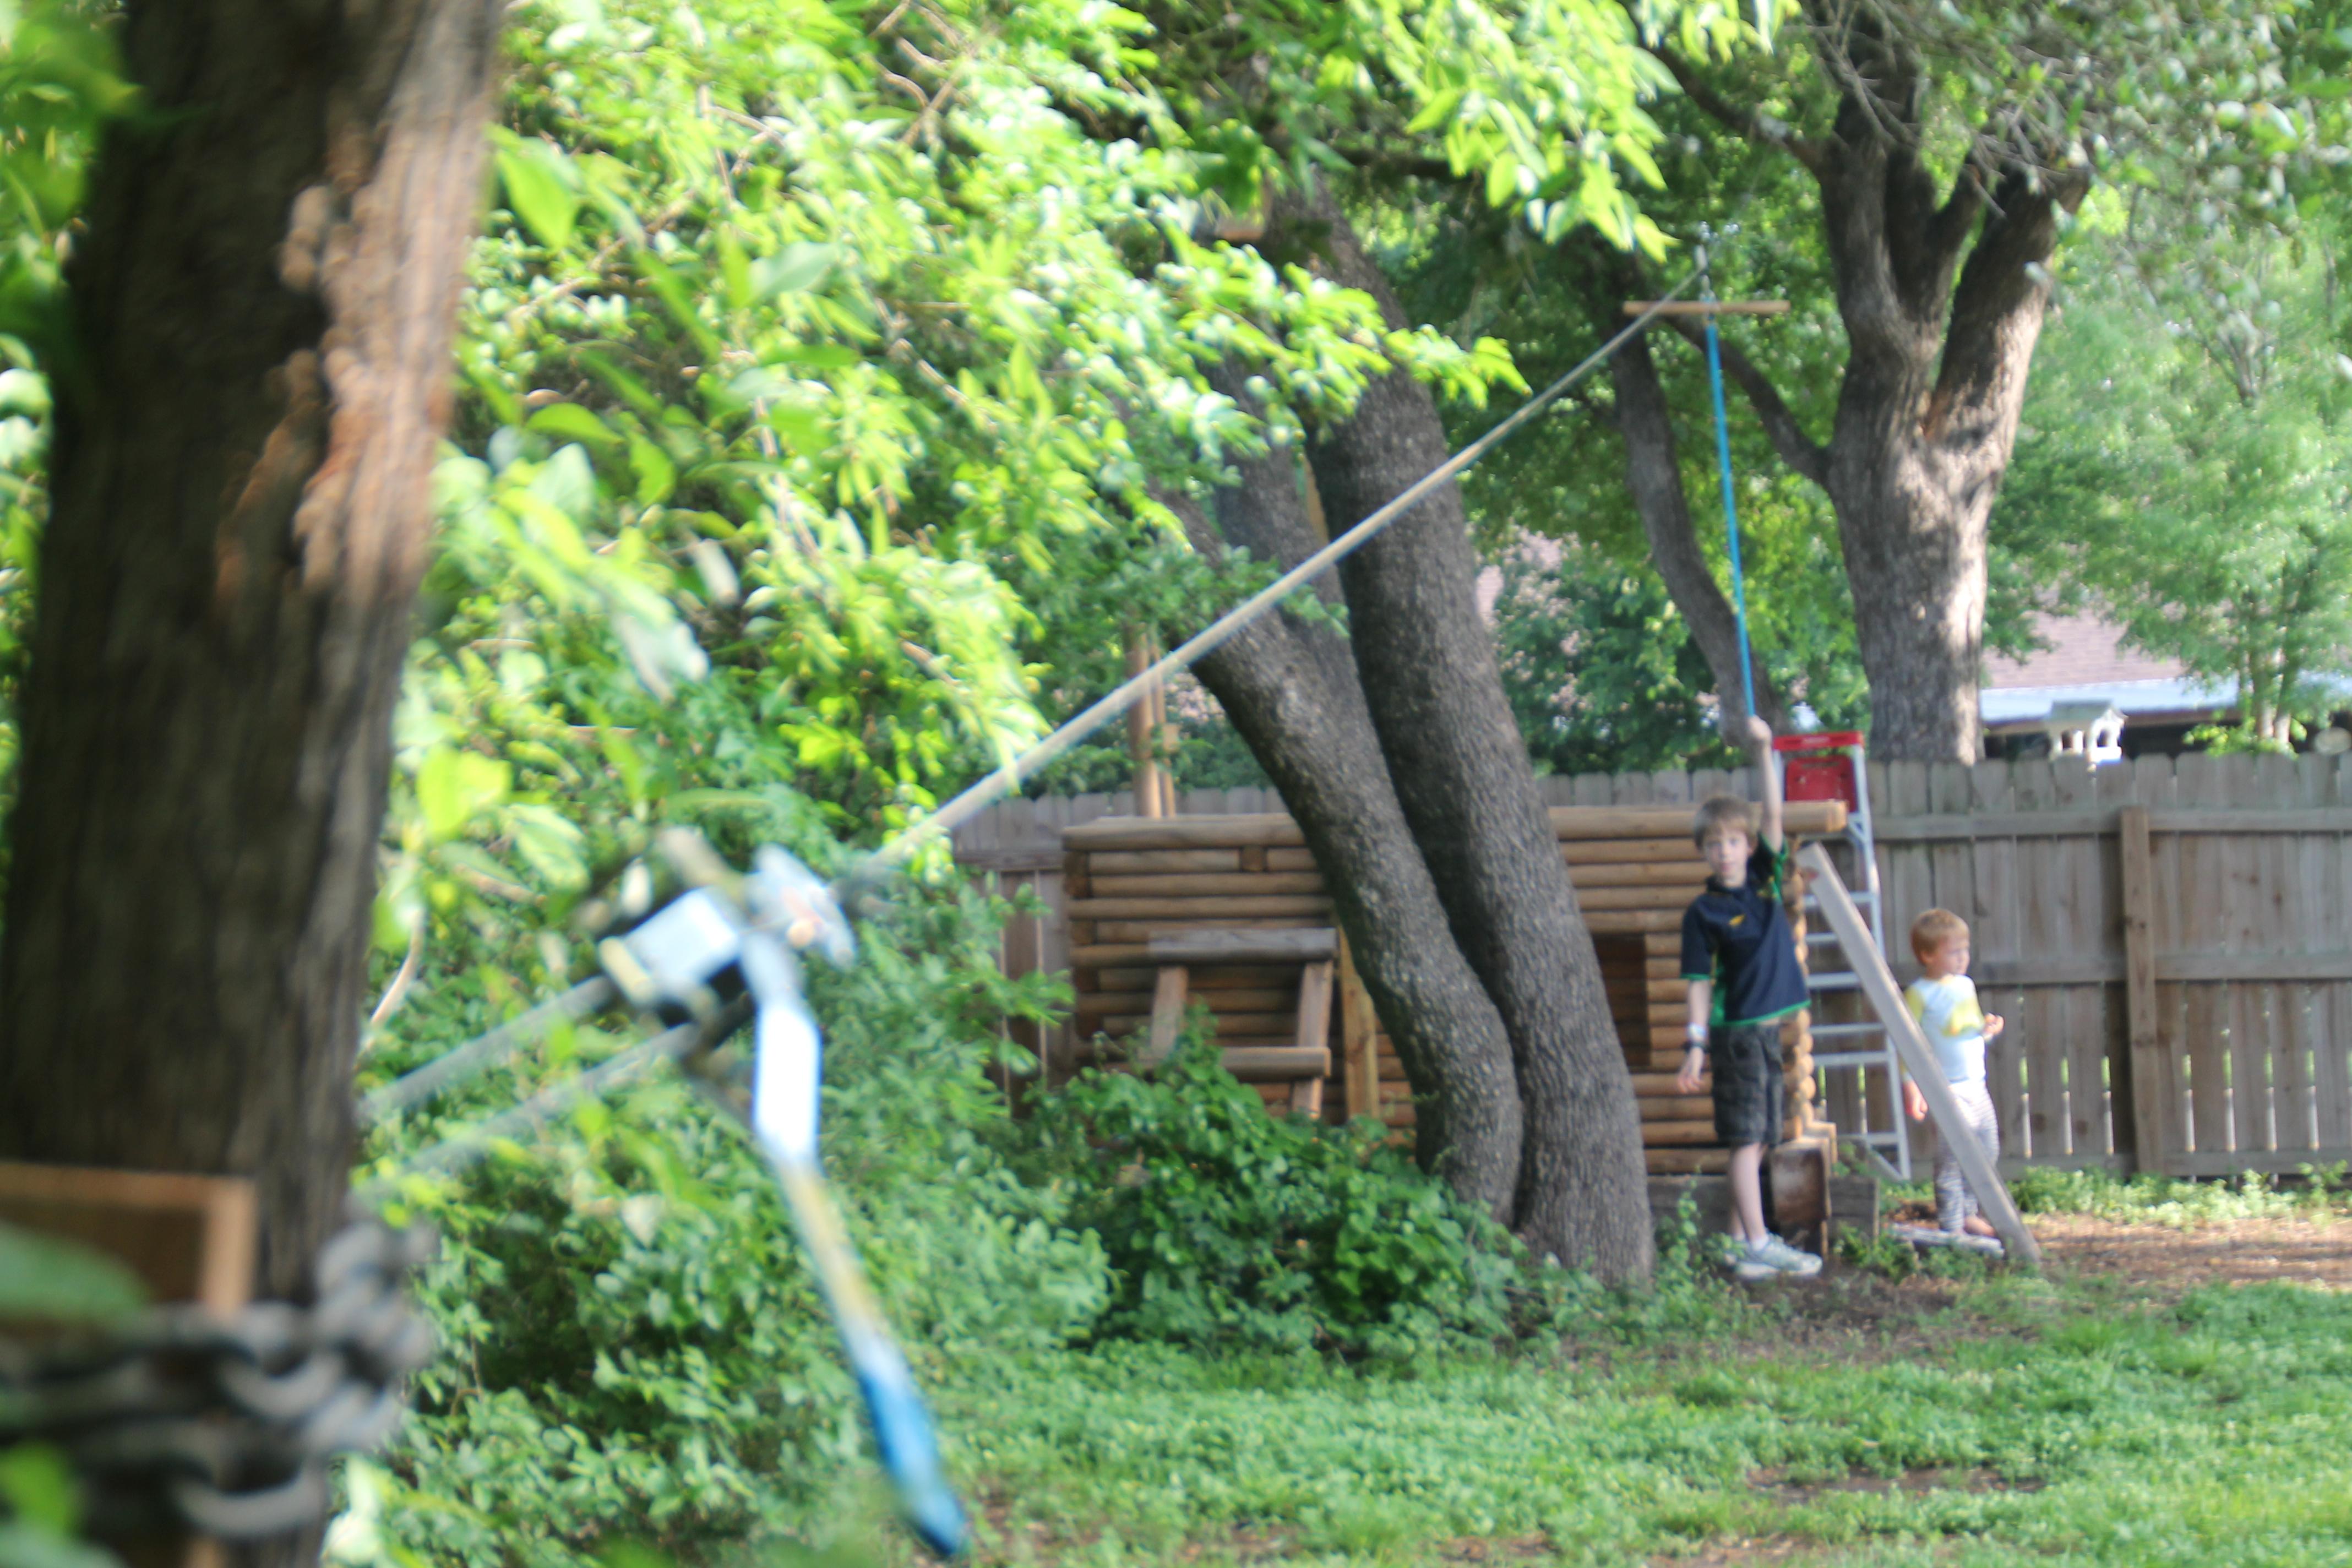 DIY Backyard Playgrounds - Buyswings.com